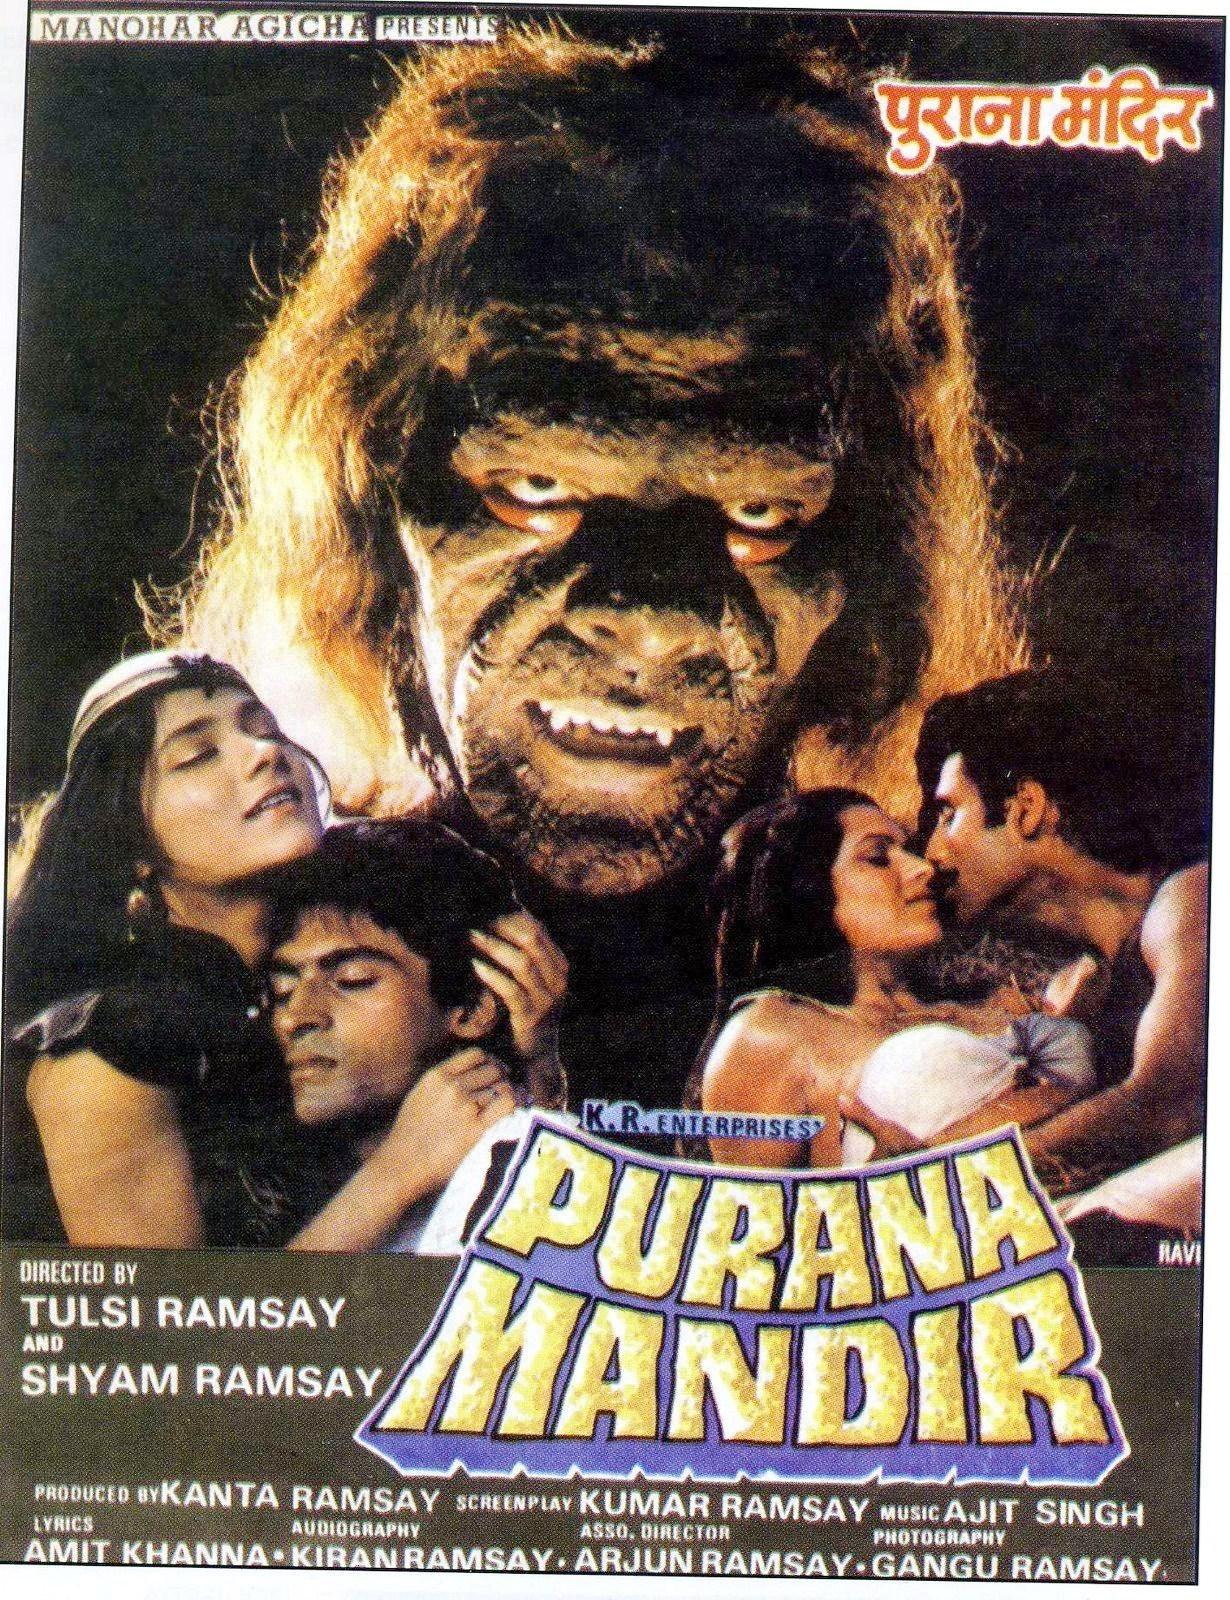 Shyam Ramsay, Master of Bollywood Horror Films, Passes Away